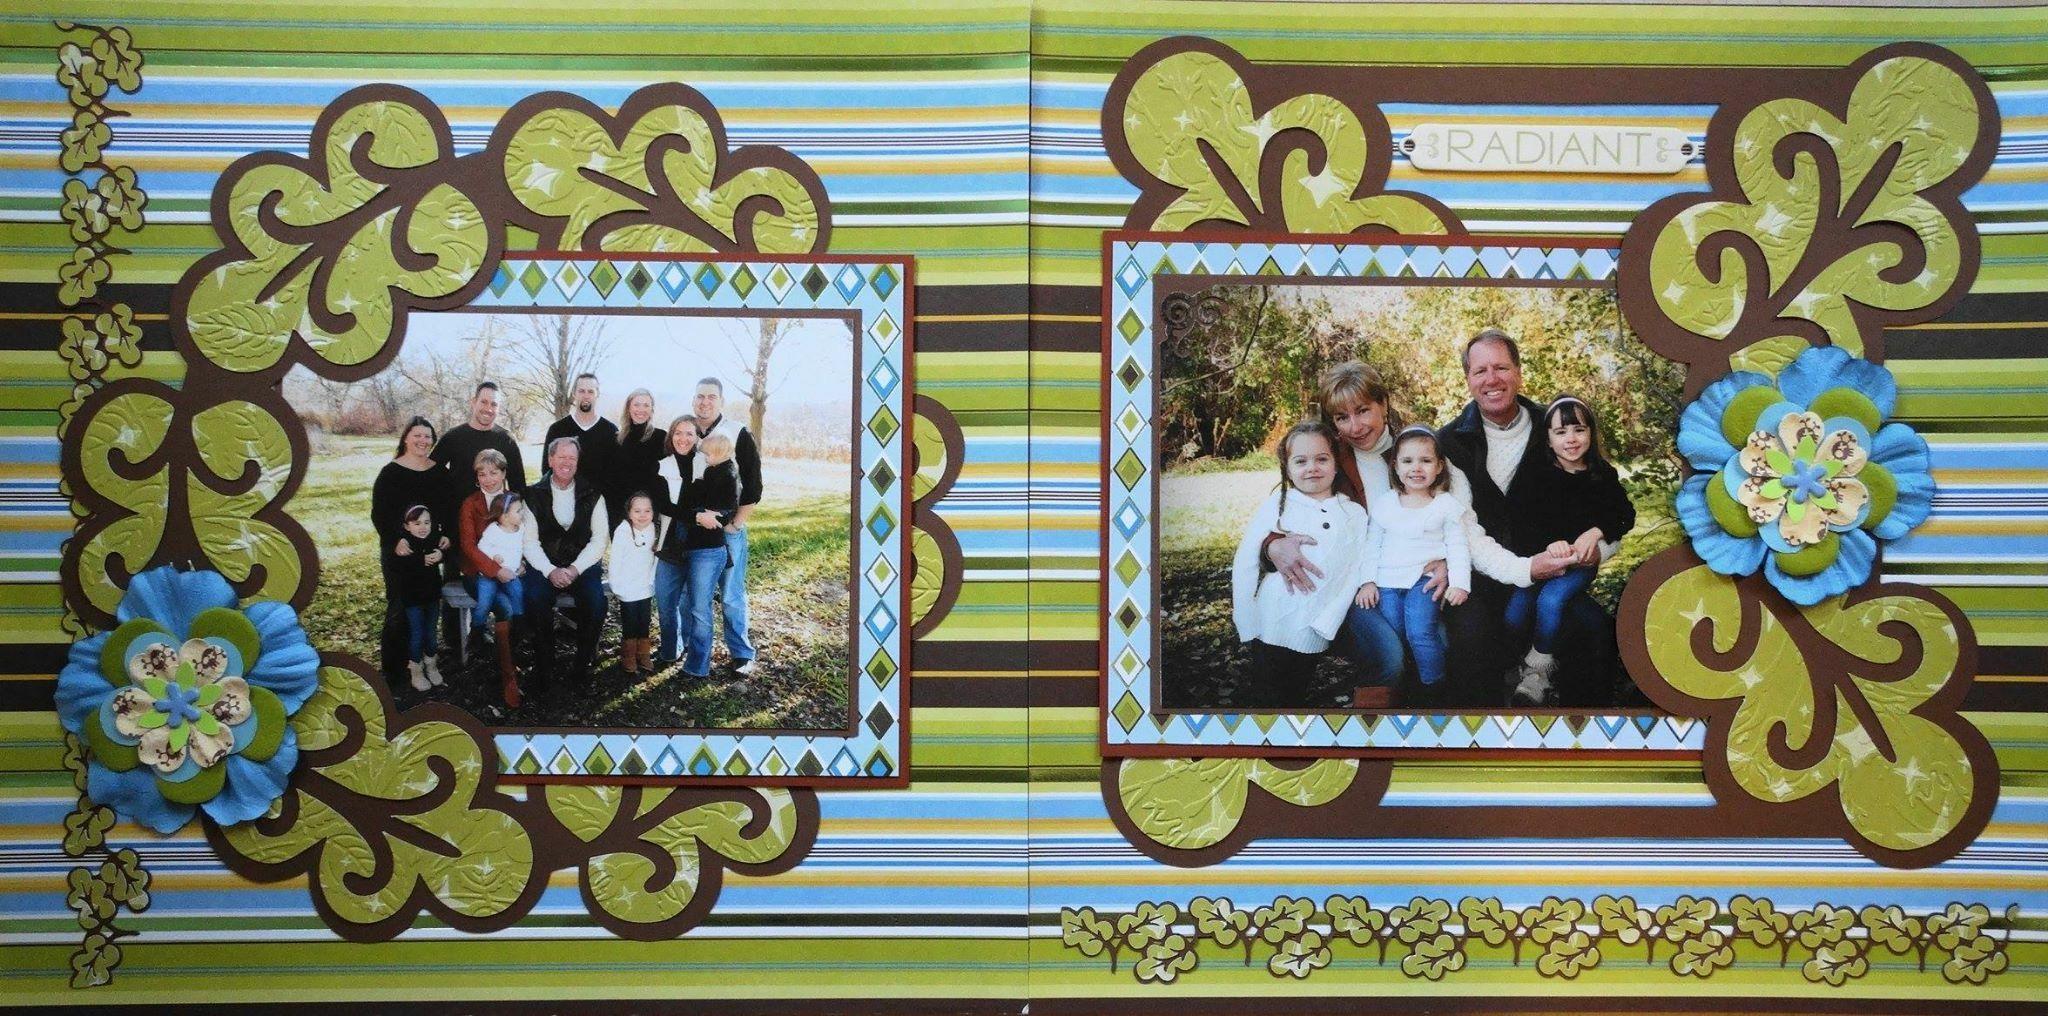 Family scrapbook ideas on pinterest - Explore Scrapbooking Larkin Scrapbooking Green And More